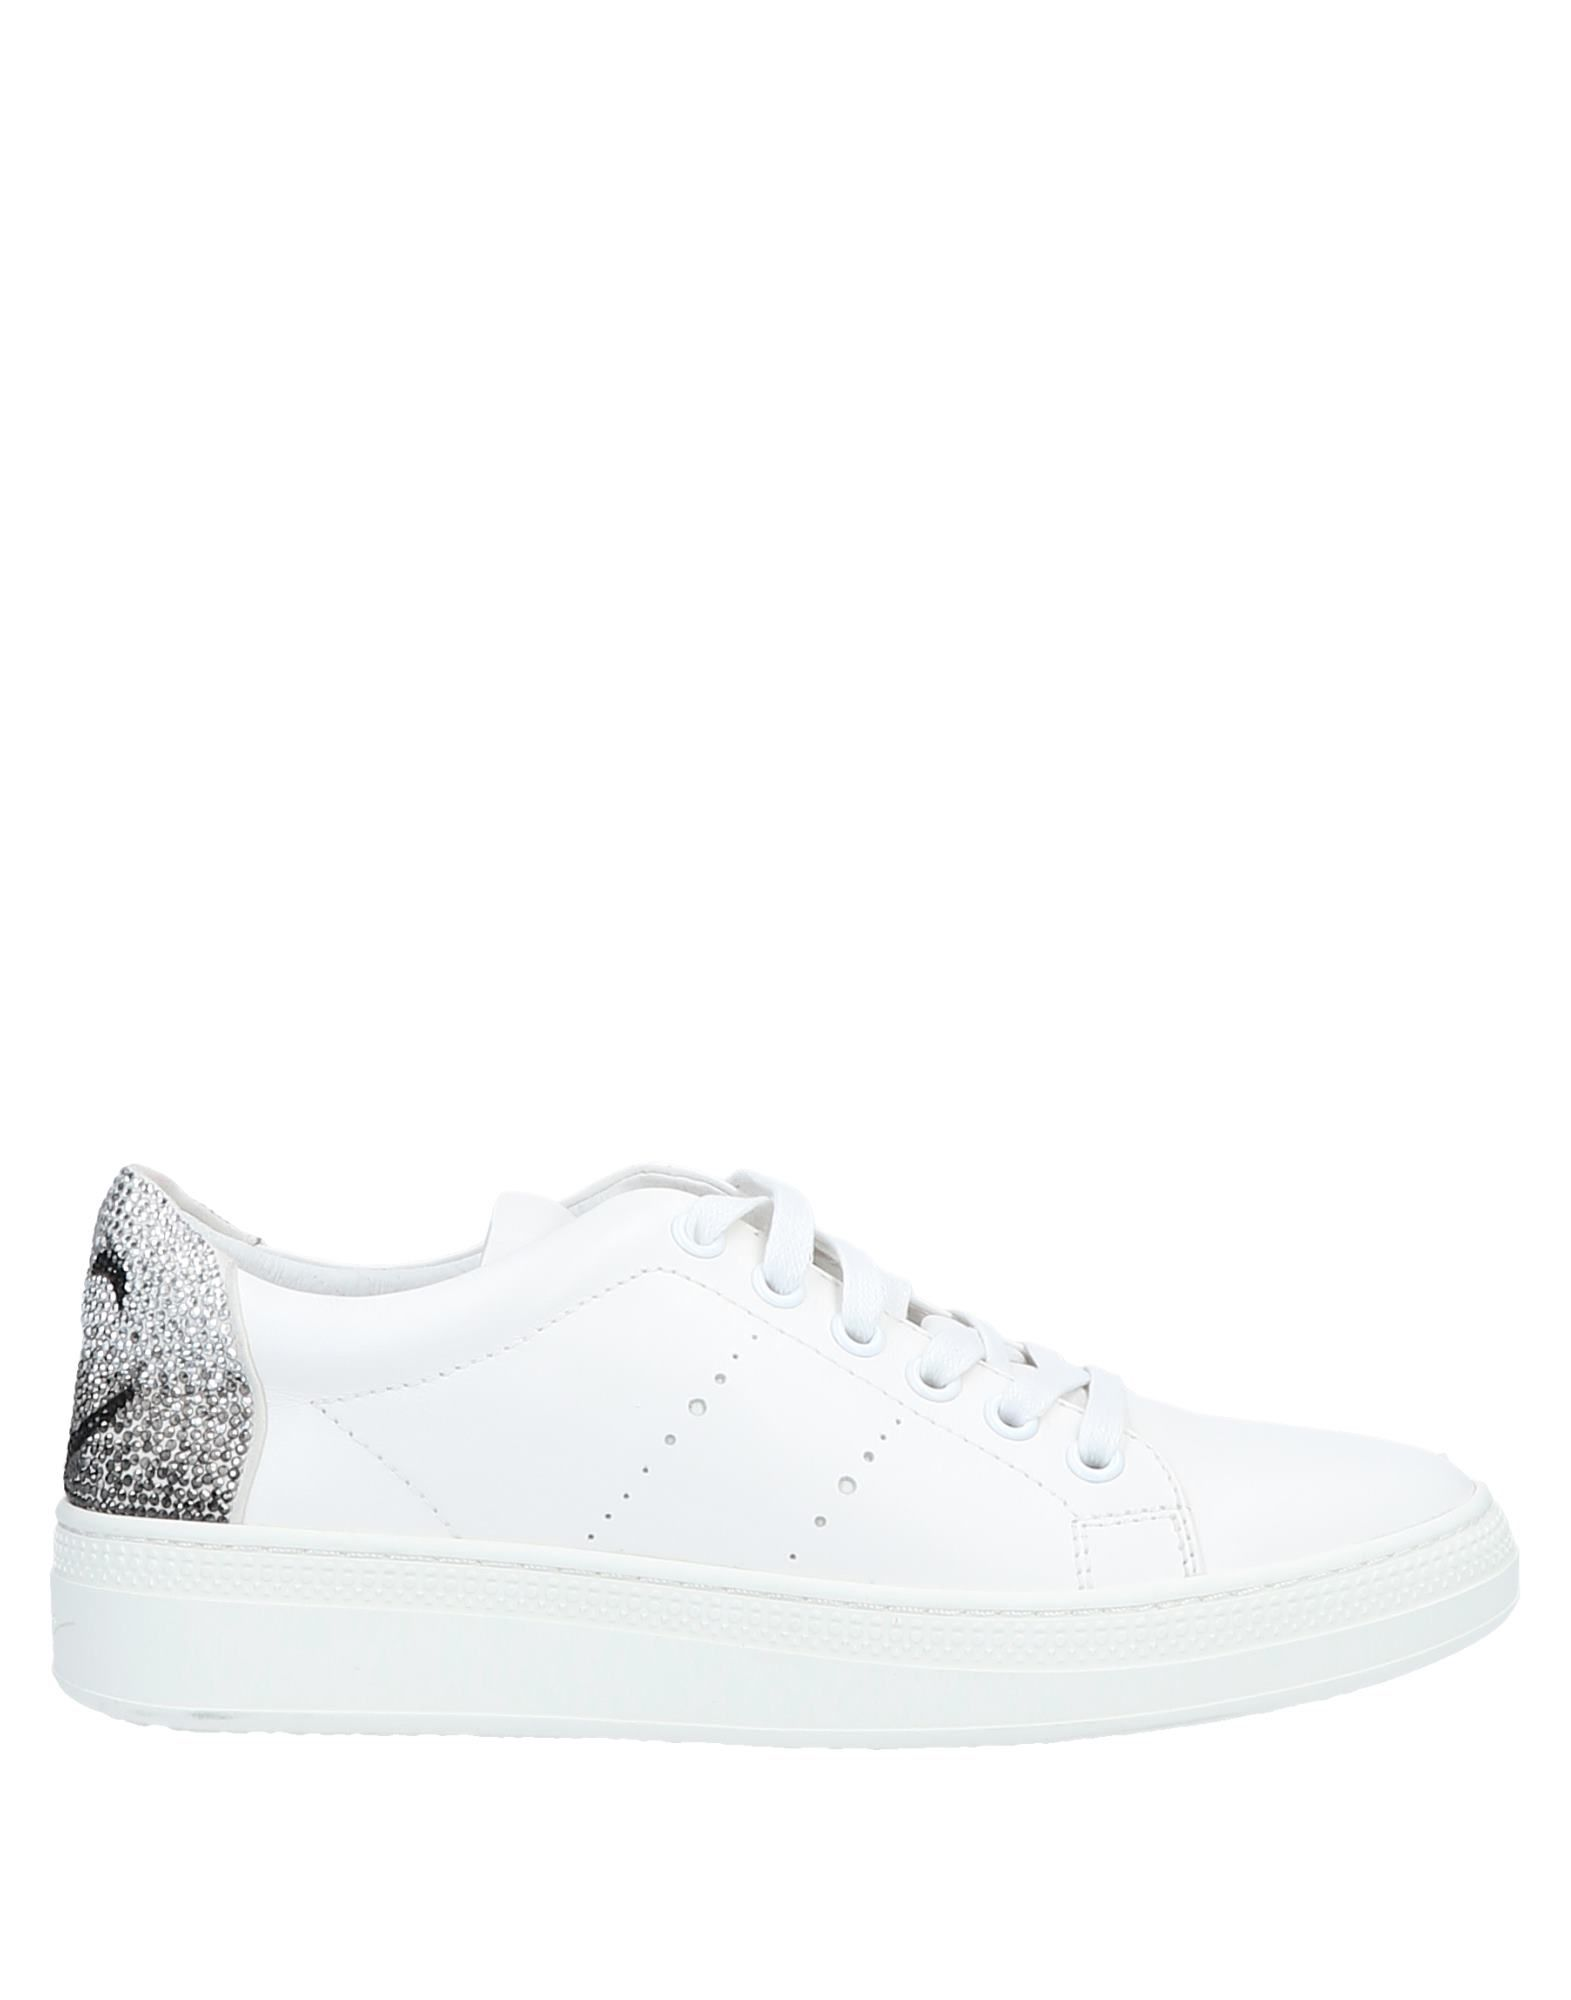 Lola Cruz Sneakers - Women on Lola Cruz Sneakers online on Women  Australia - 11553251AU 487ef7